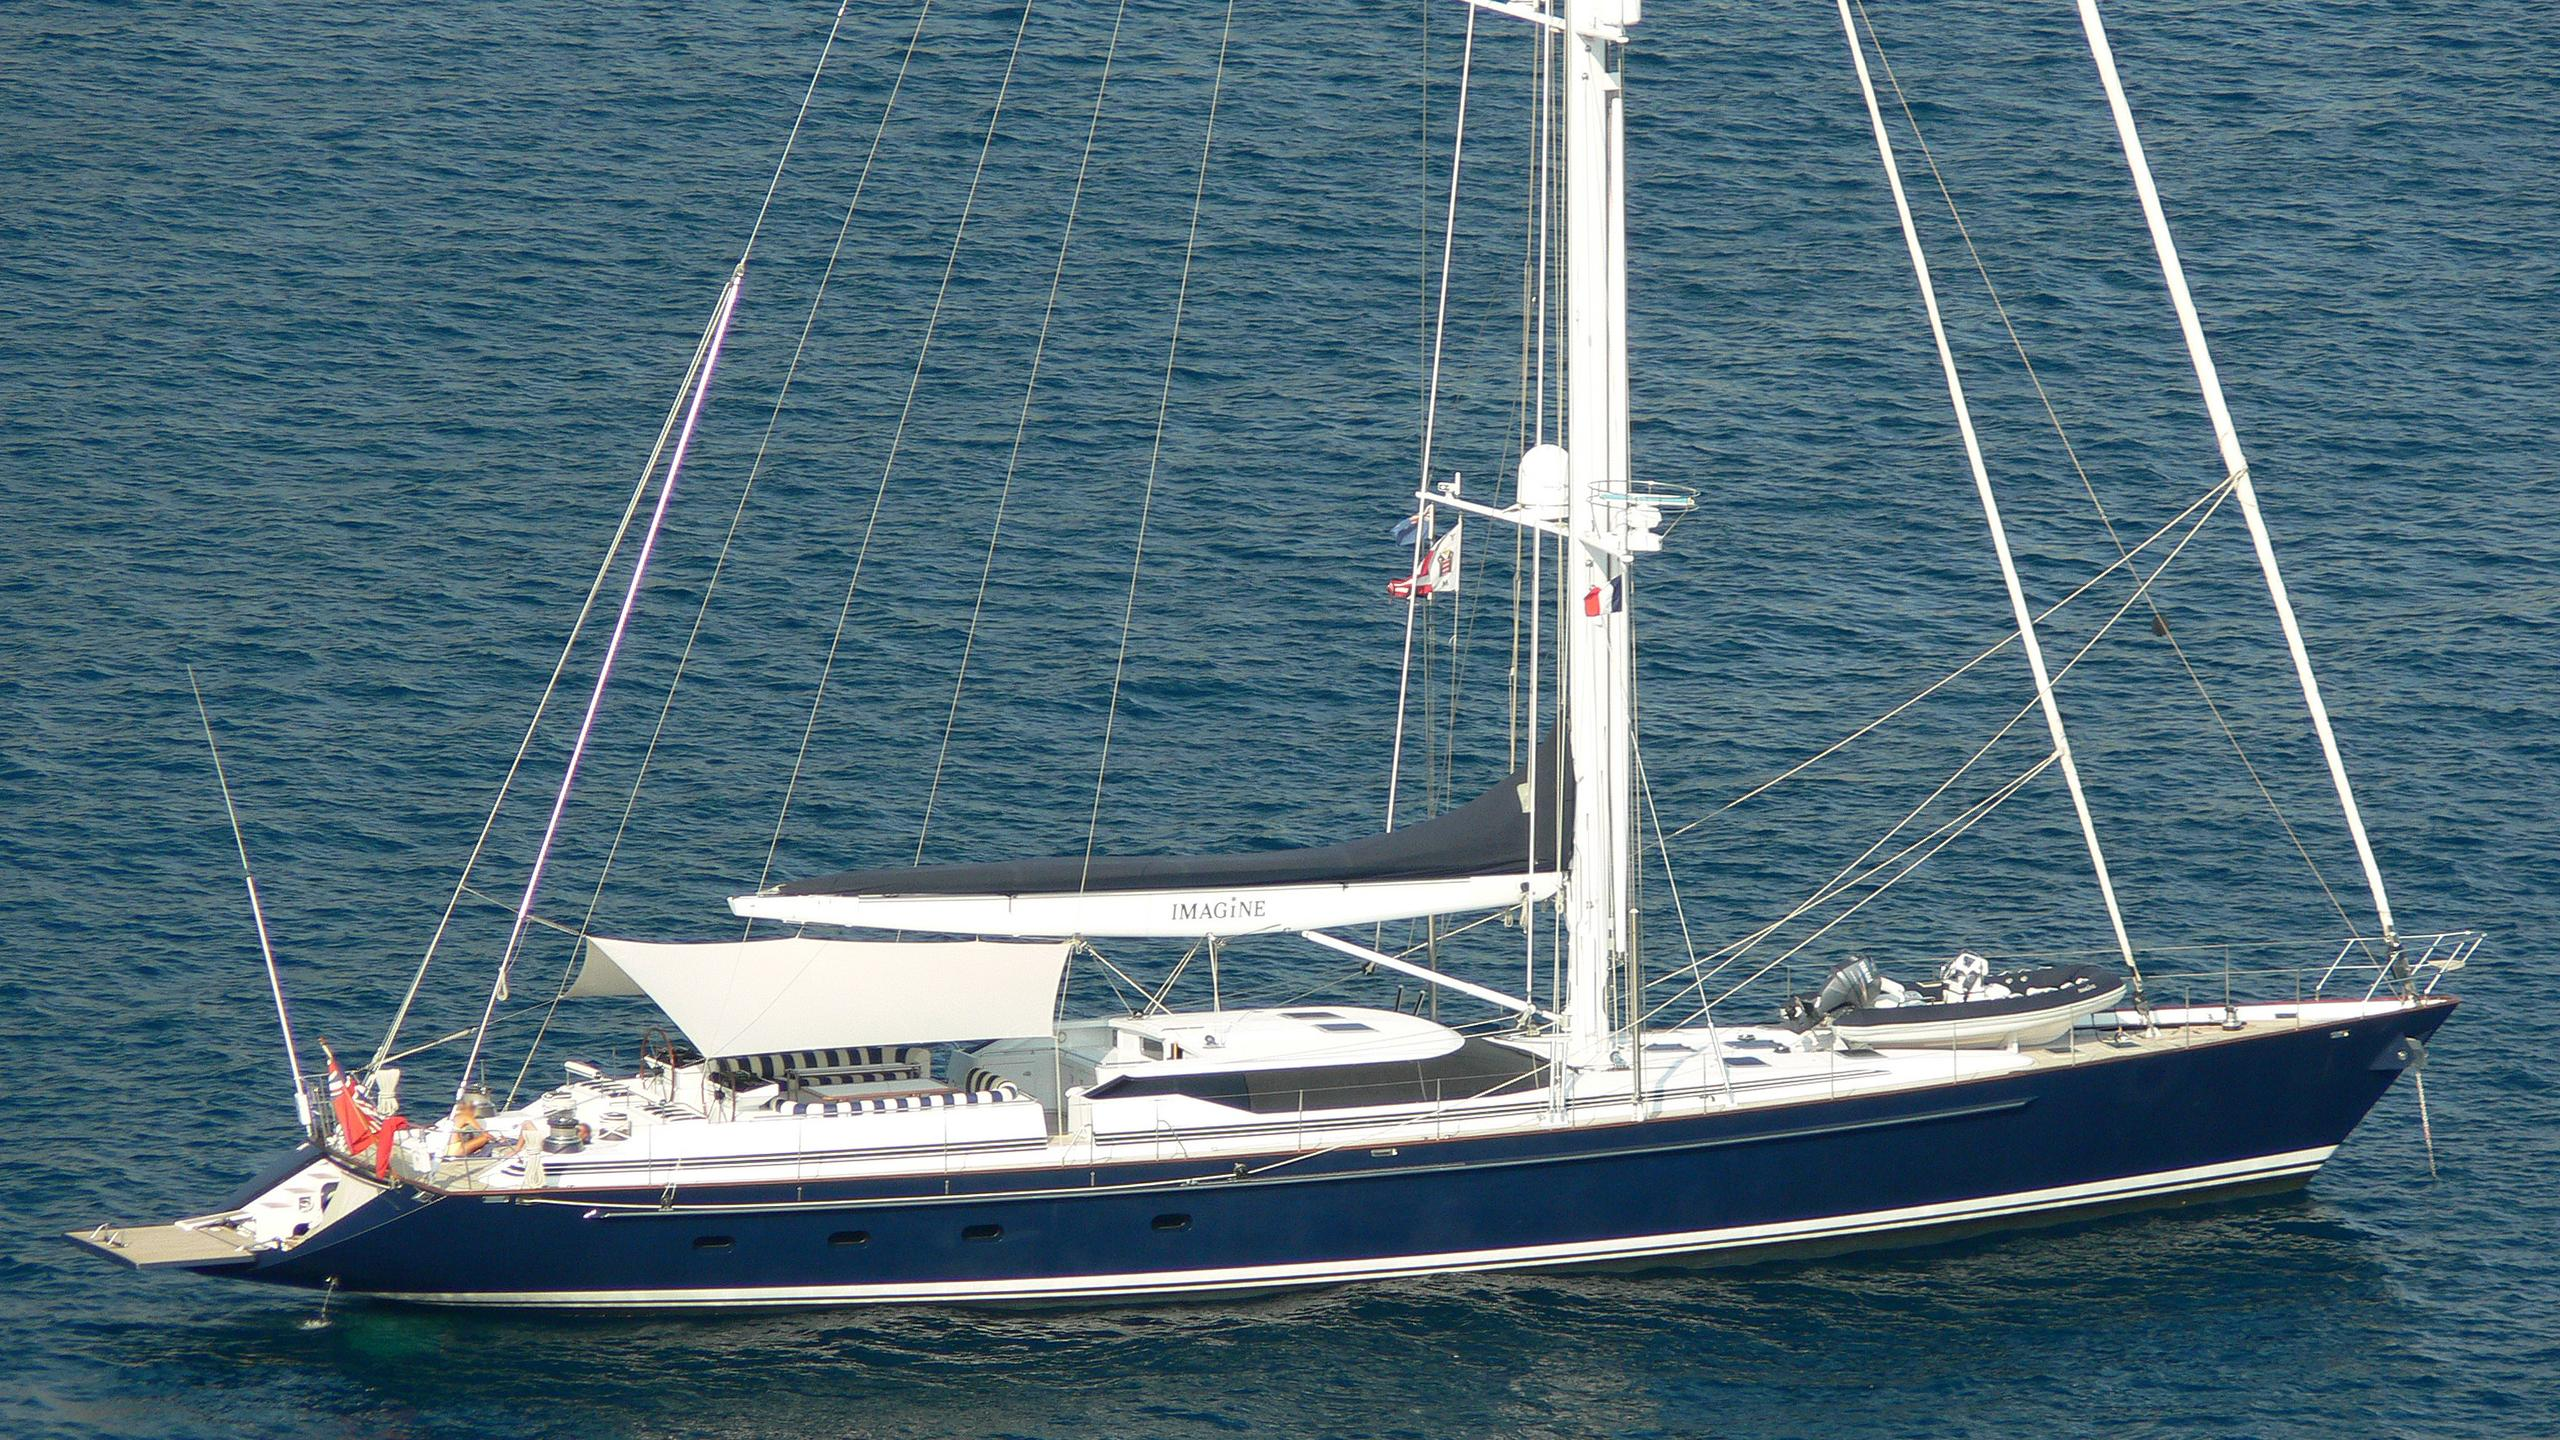 imagine-sailing-yacht-alloy-1993-34m-profile